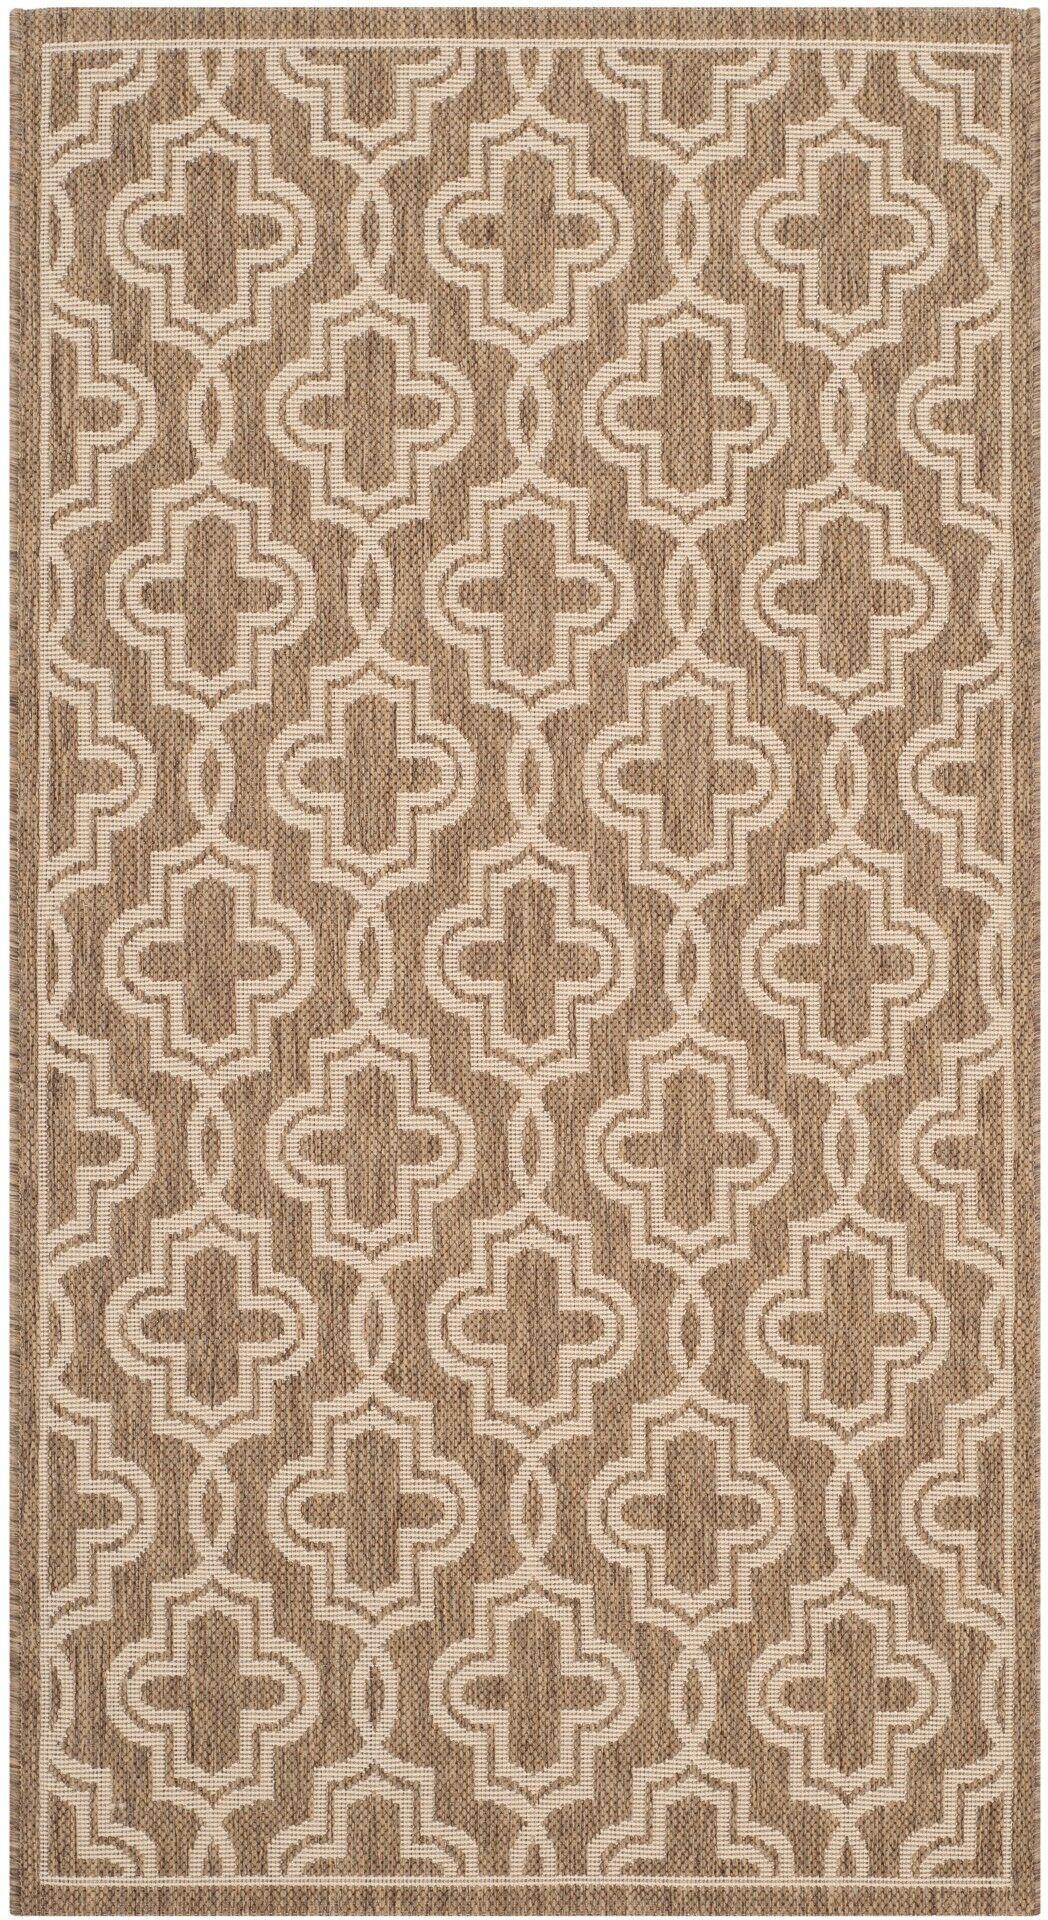 Martha Stewart Brown/Beige Area Rug Rug Size: Rectangle 4' x 5'7